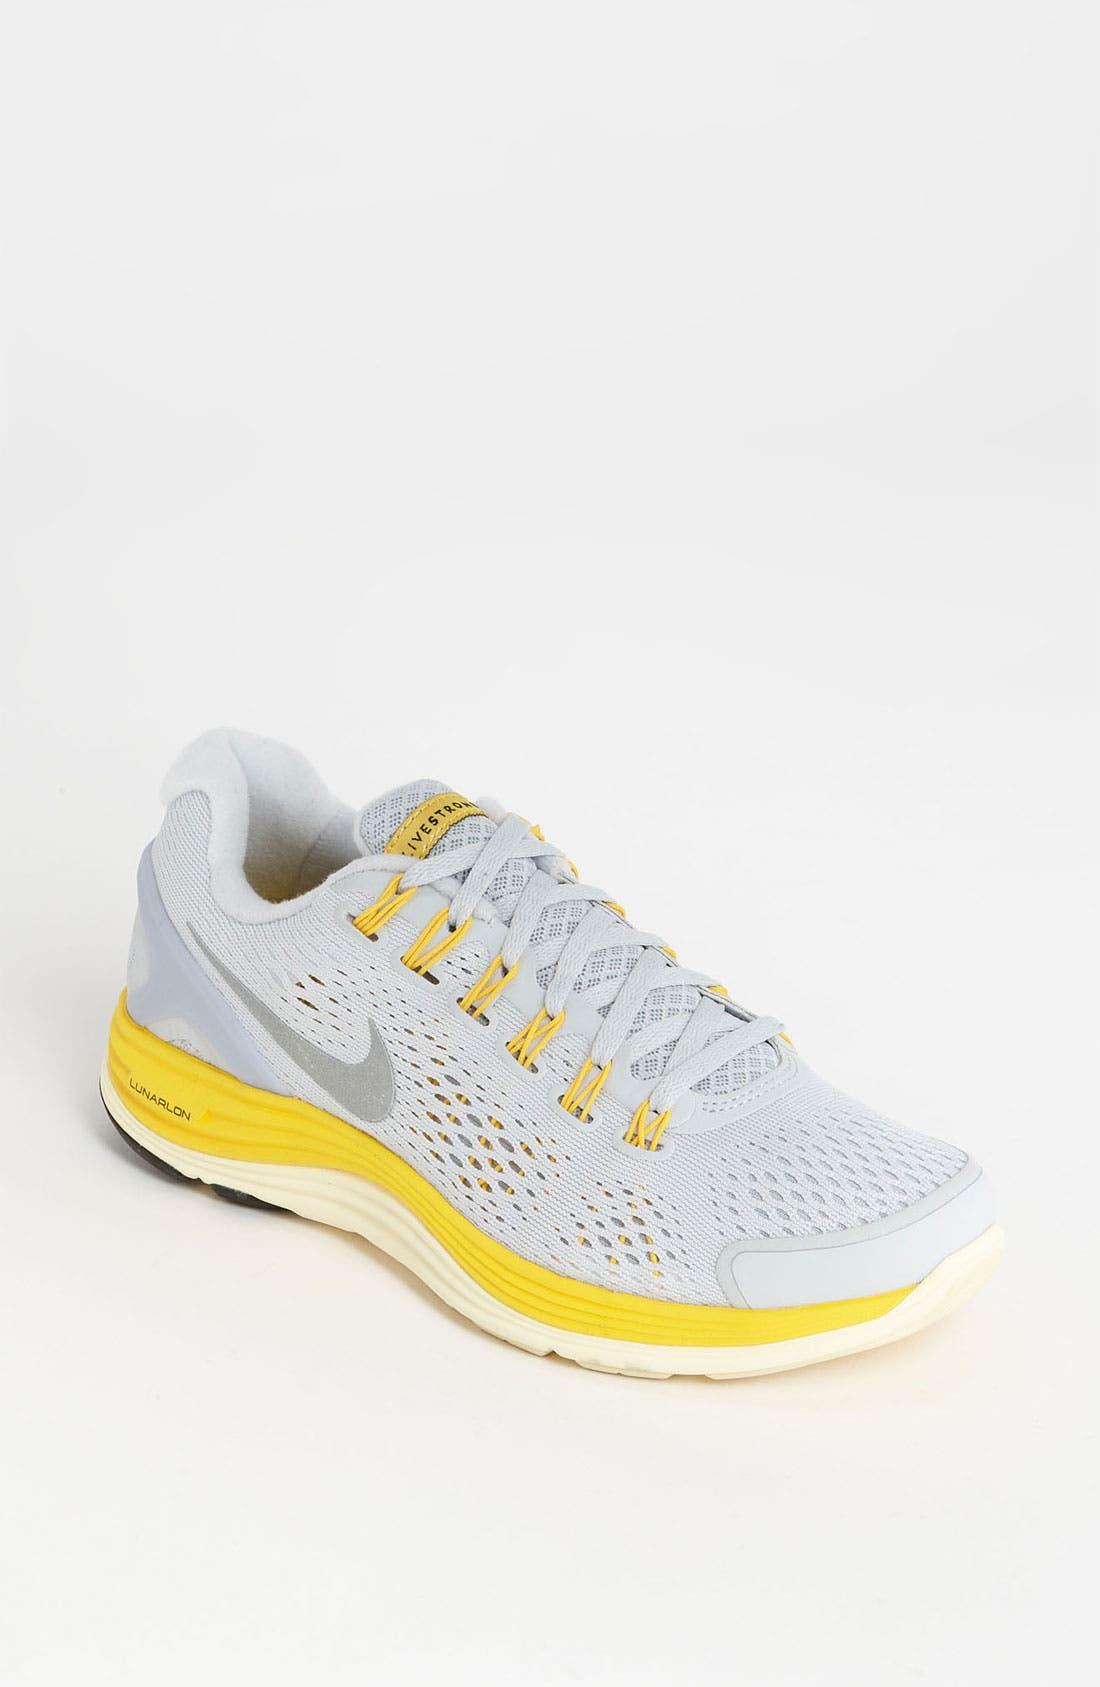 Alternate Image 1 Selected - Nike 'LunarGlide 4 Livestrong' Running Shoe (Women)